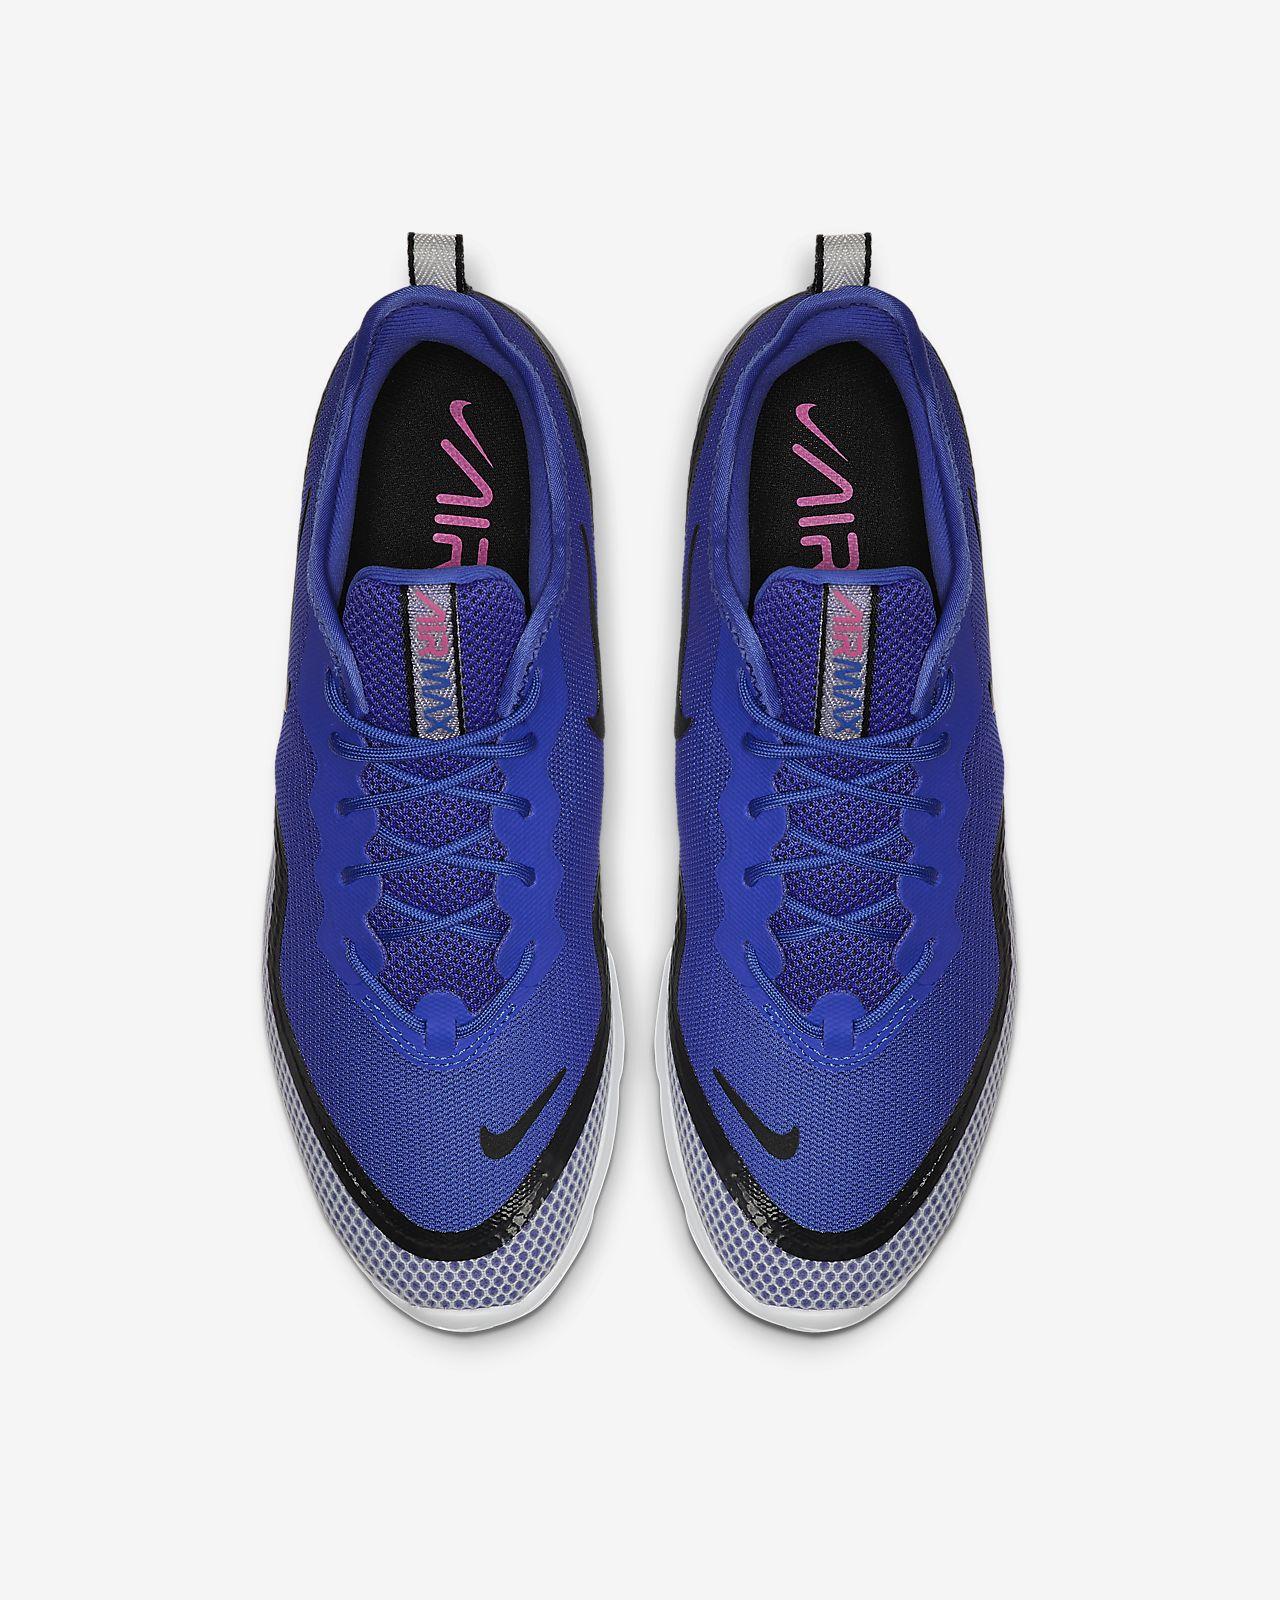 56c88ed0b Nike Air Max Sequent 4.5 SE Men's Shoe. Nike.com NL